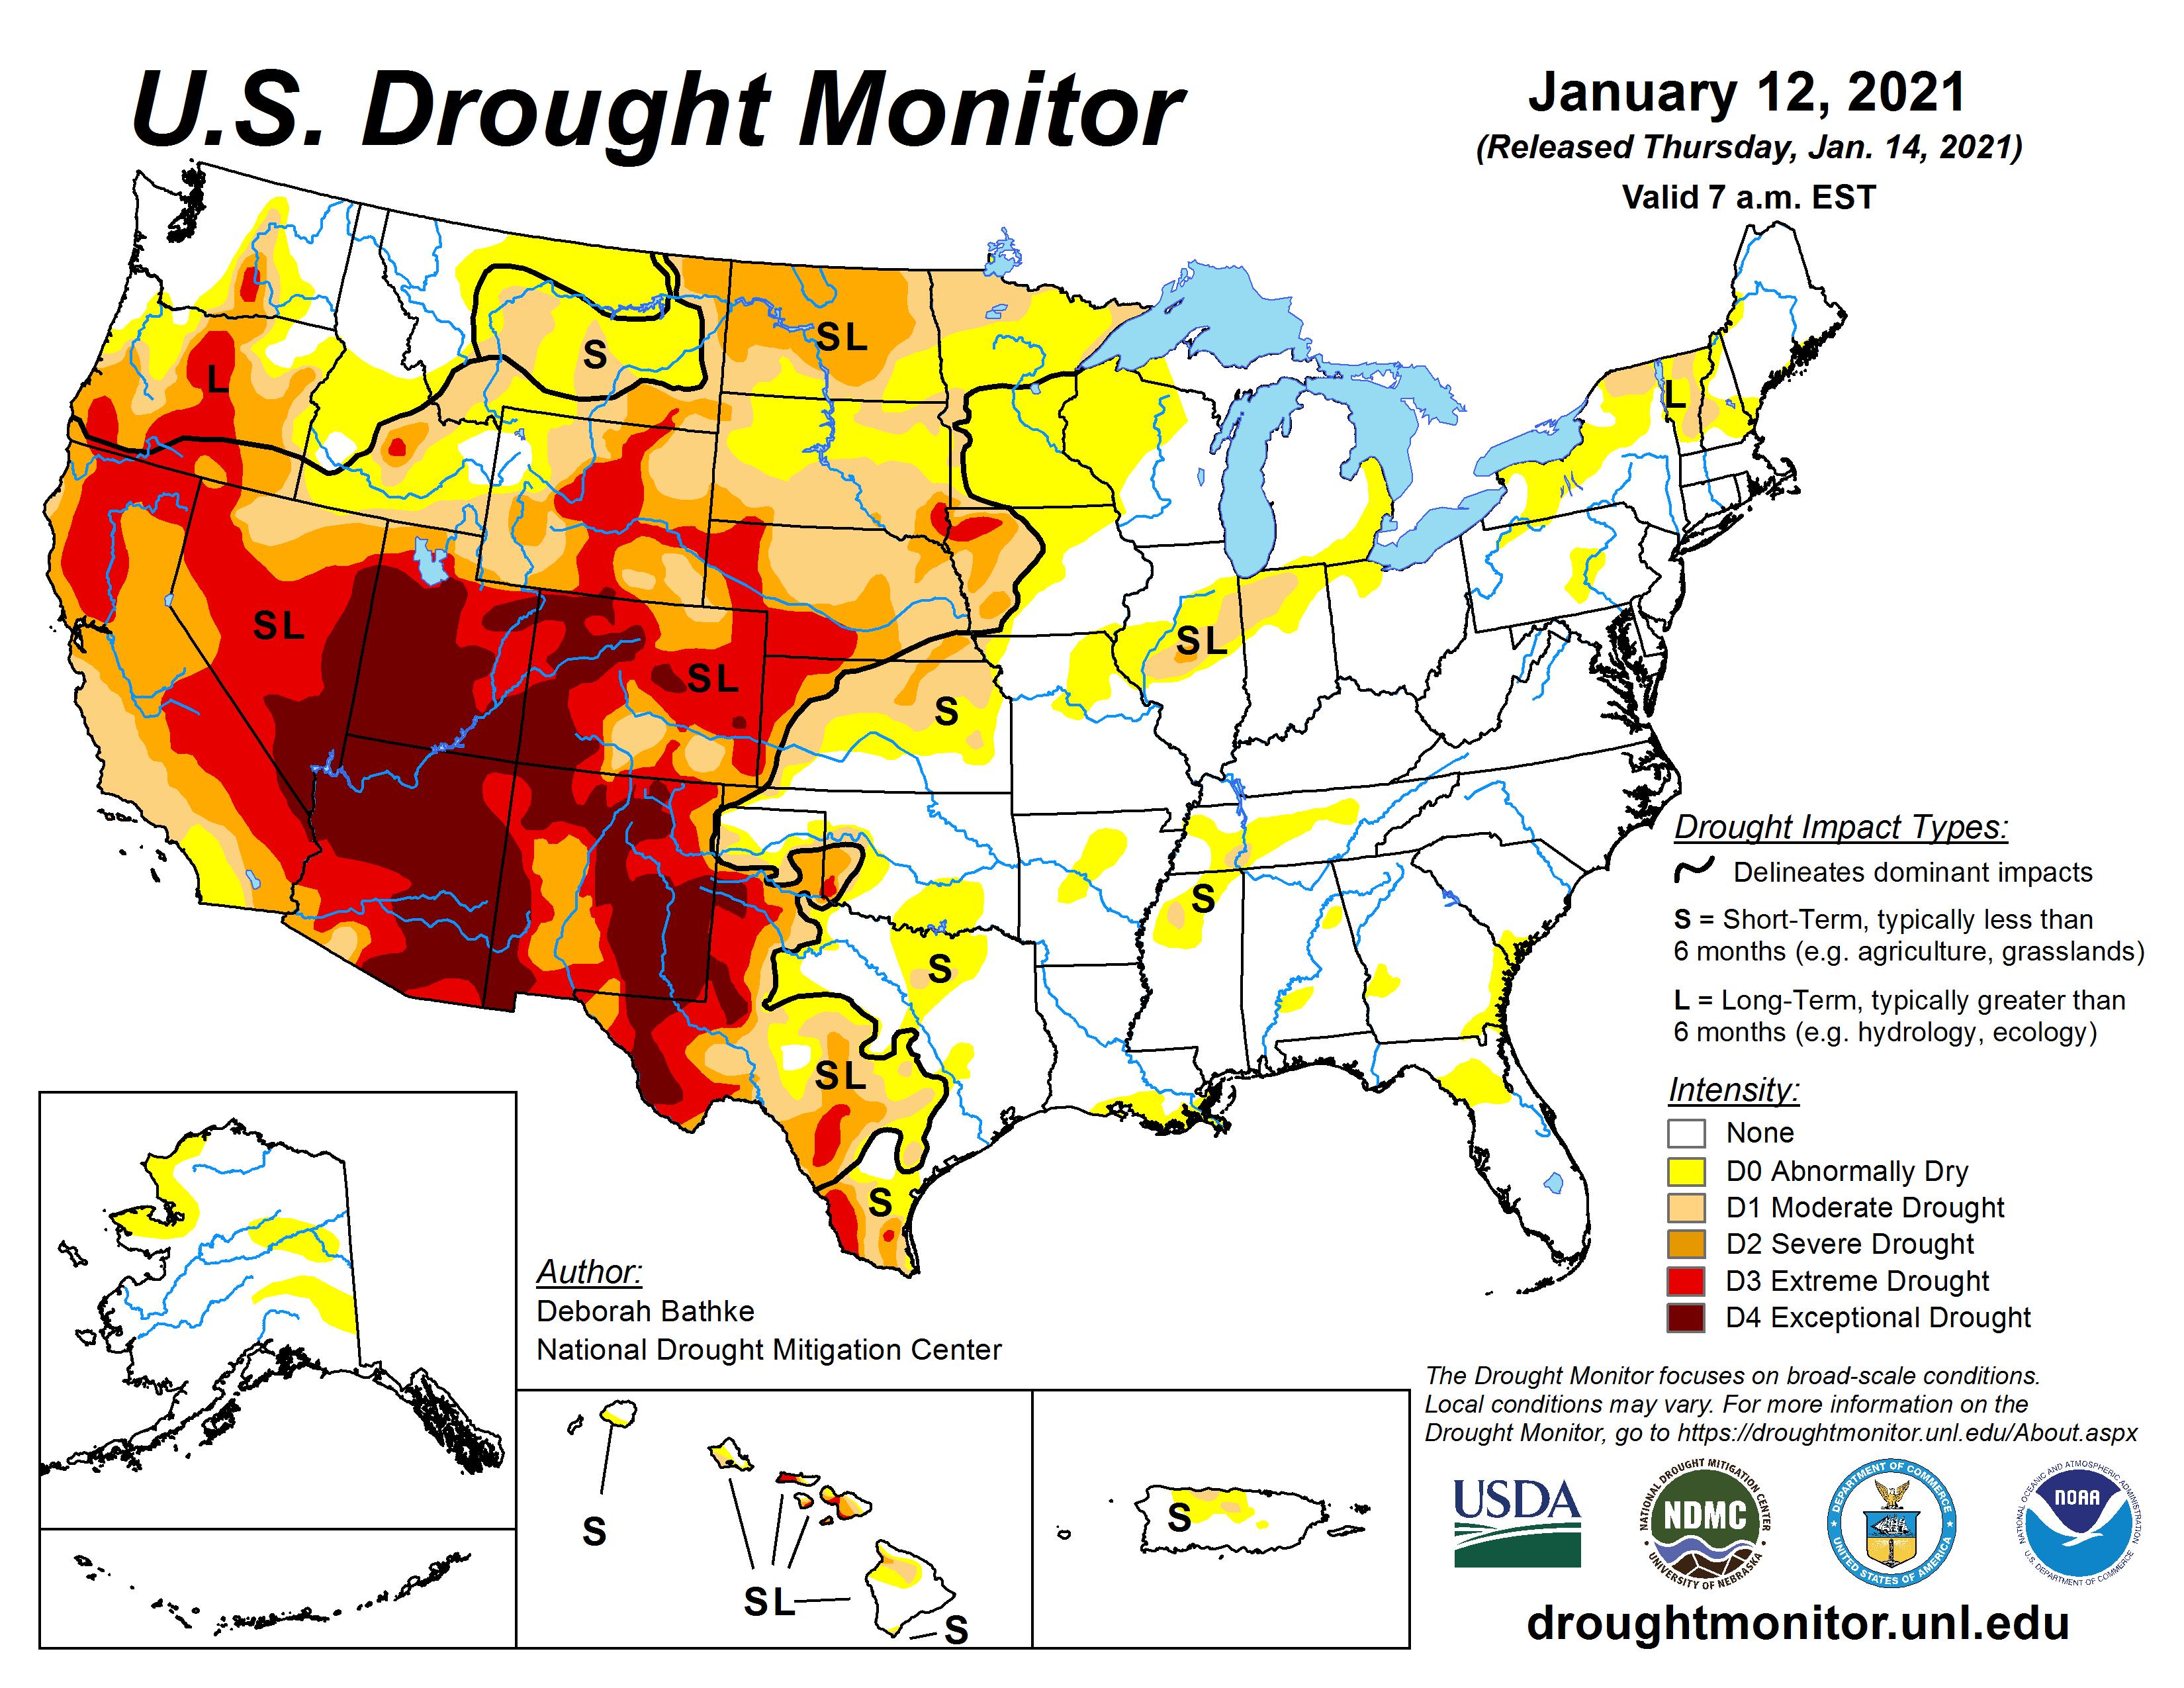 US Drought Monitor Map, Jan. 14, 2021